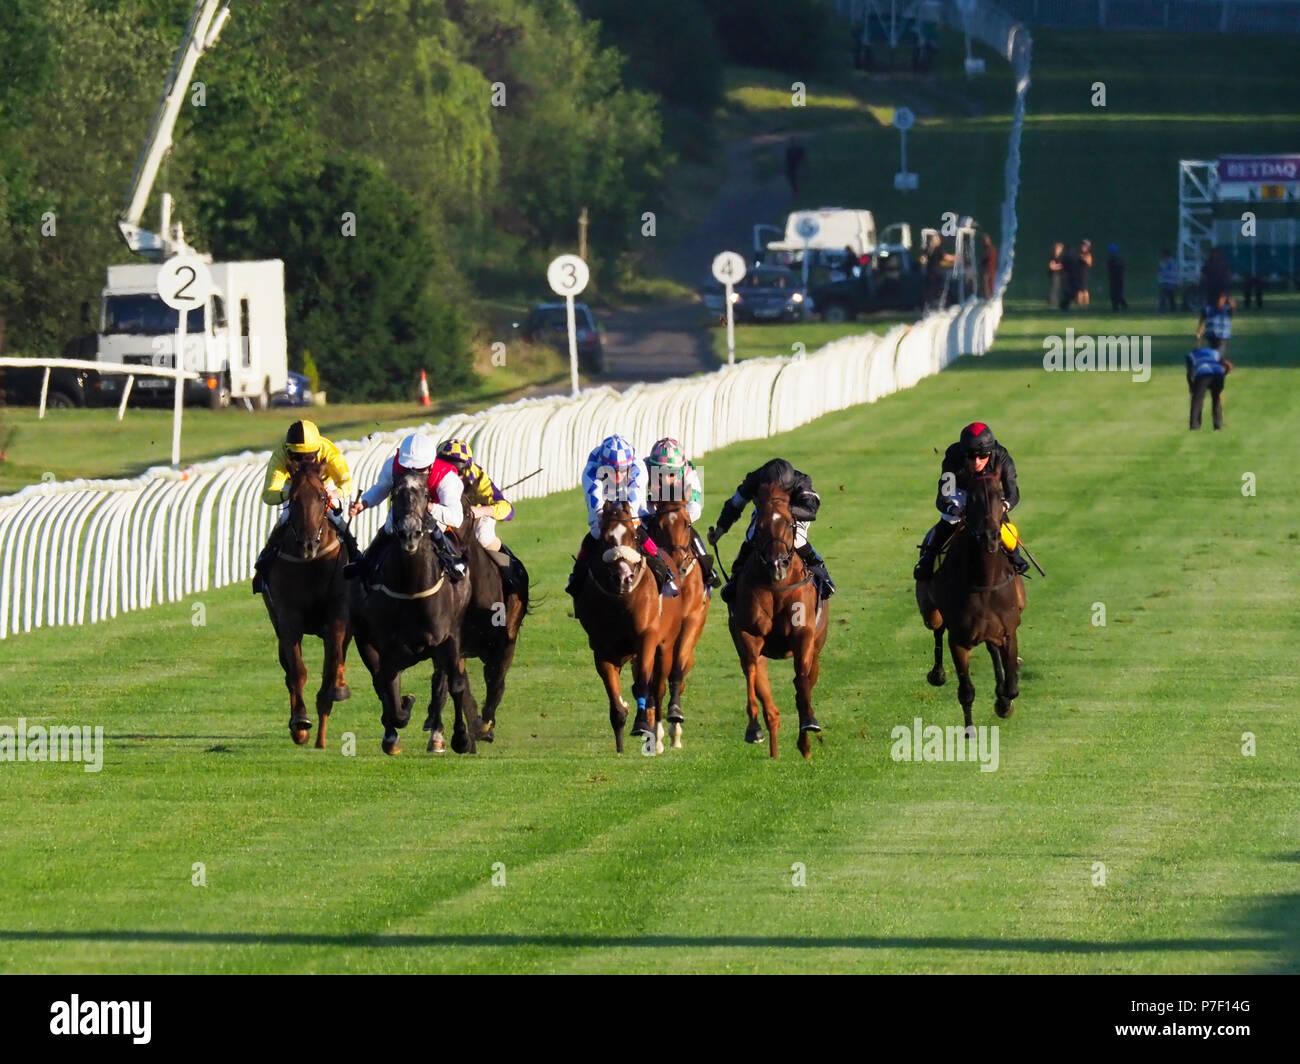 Lingfield Races - Stock Image